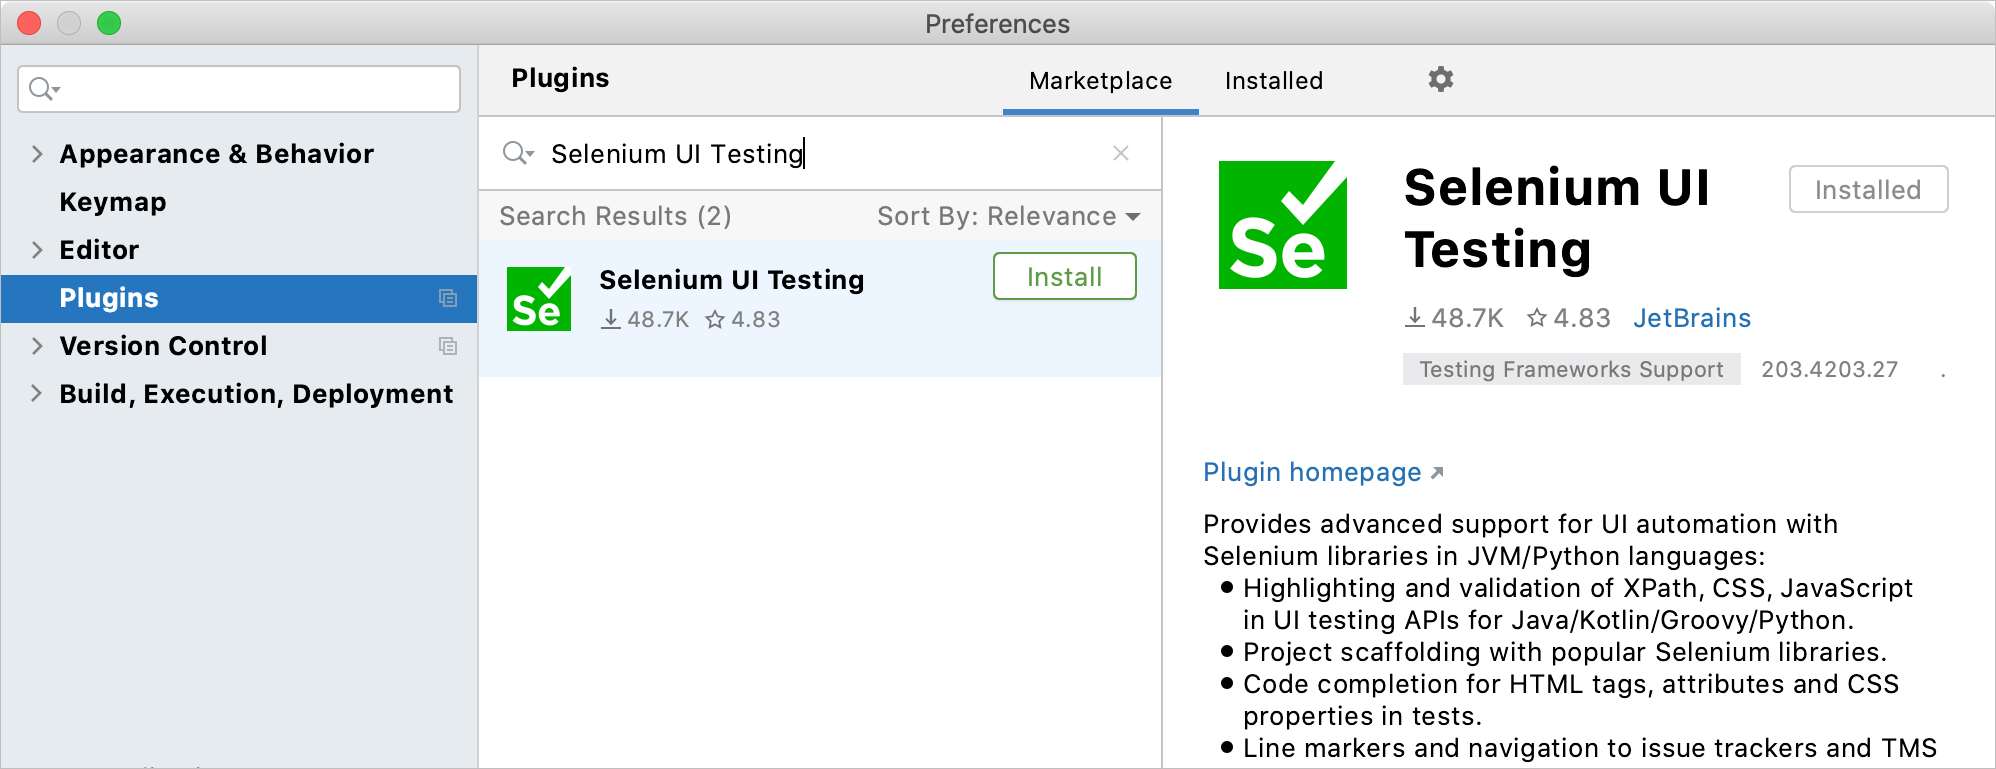 Installing the Selenium UI Testing plugin plugin